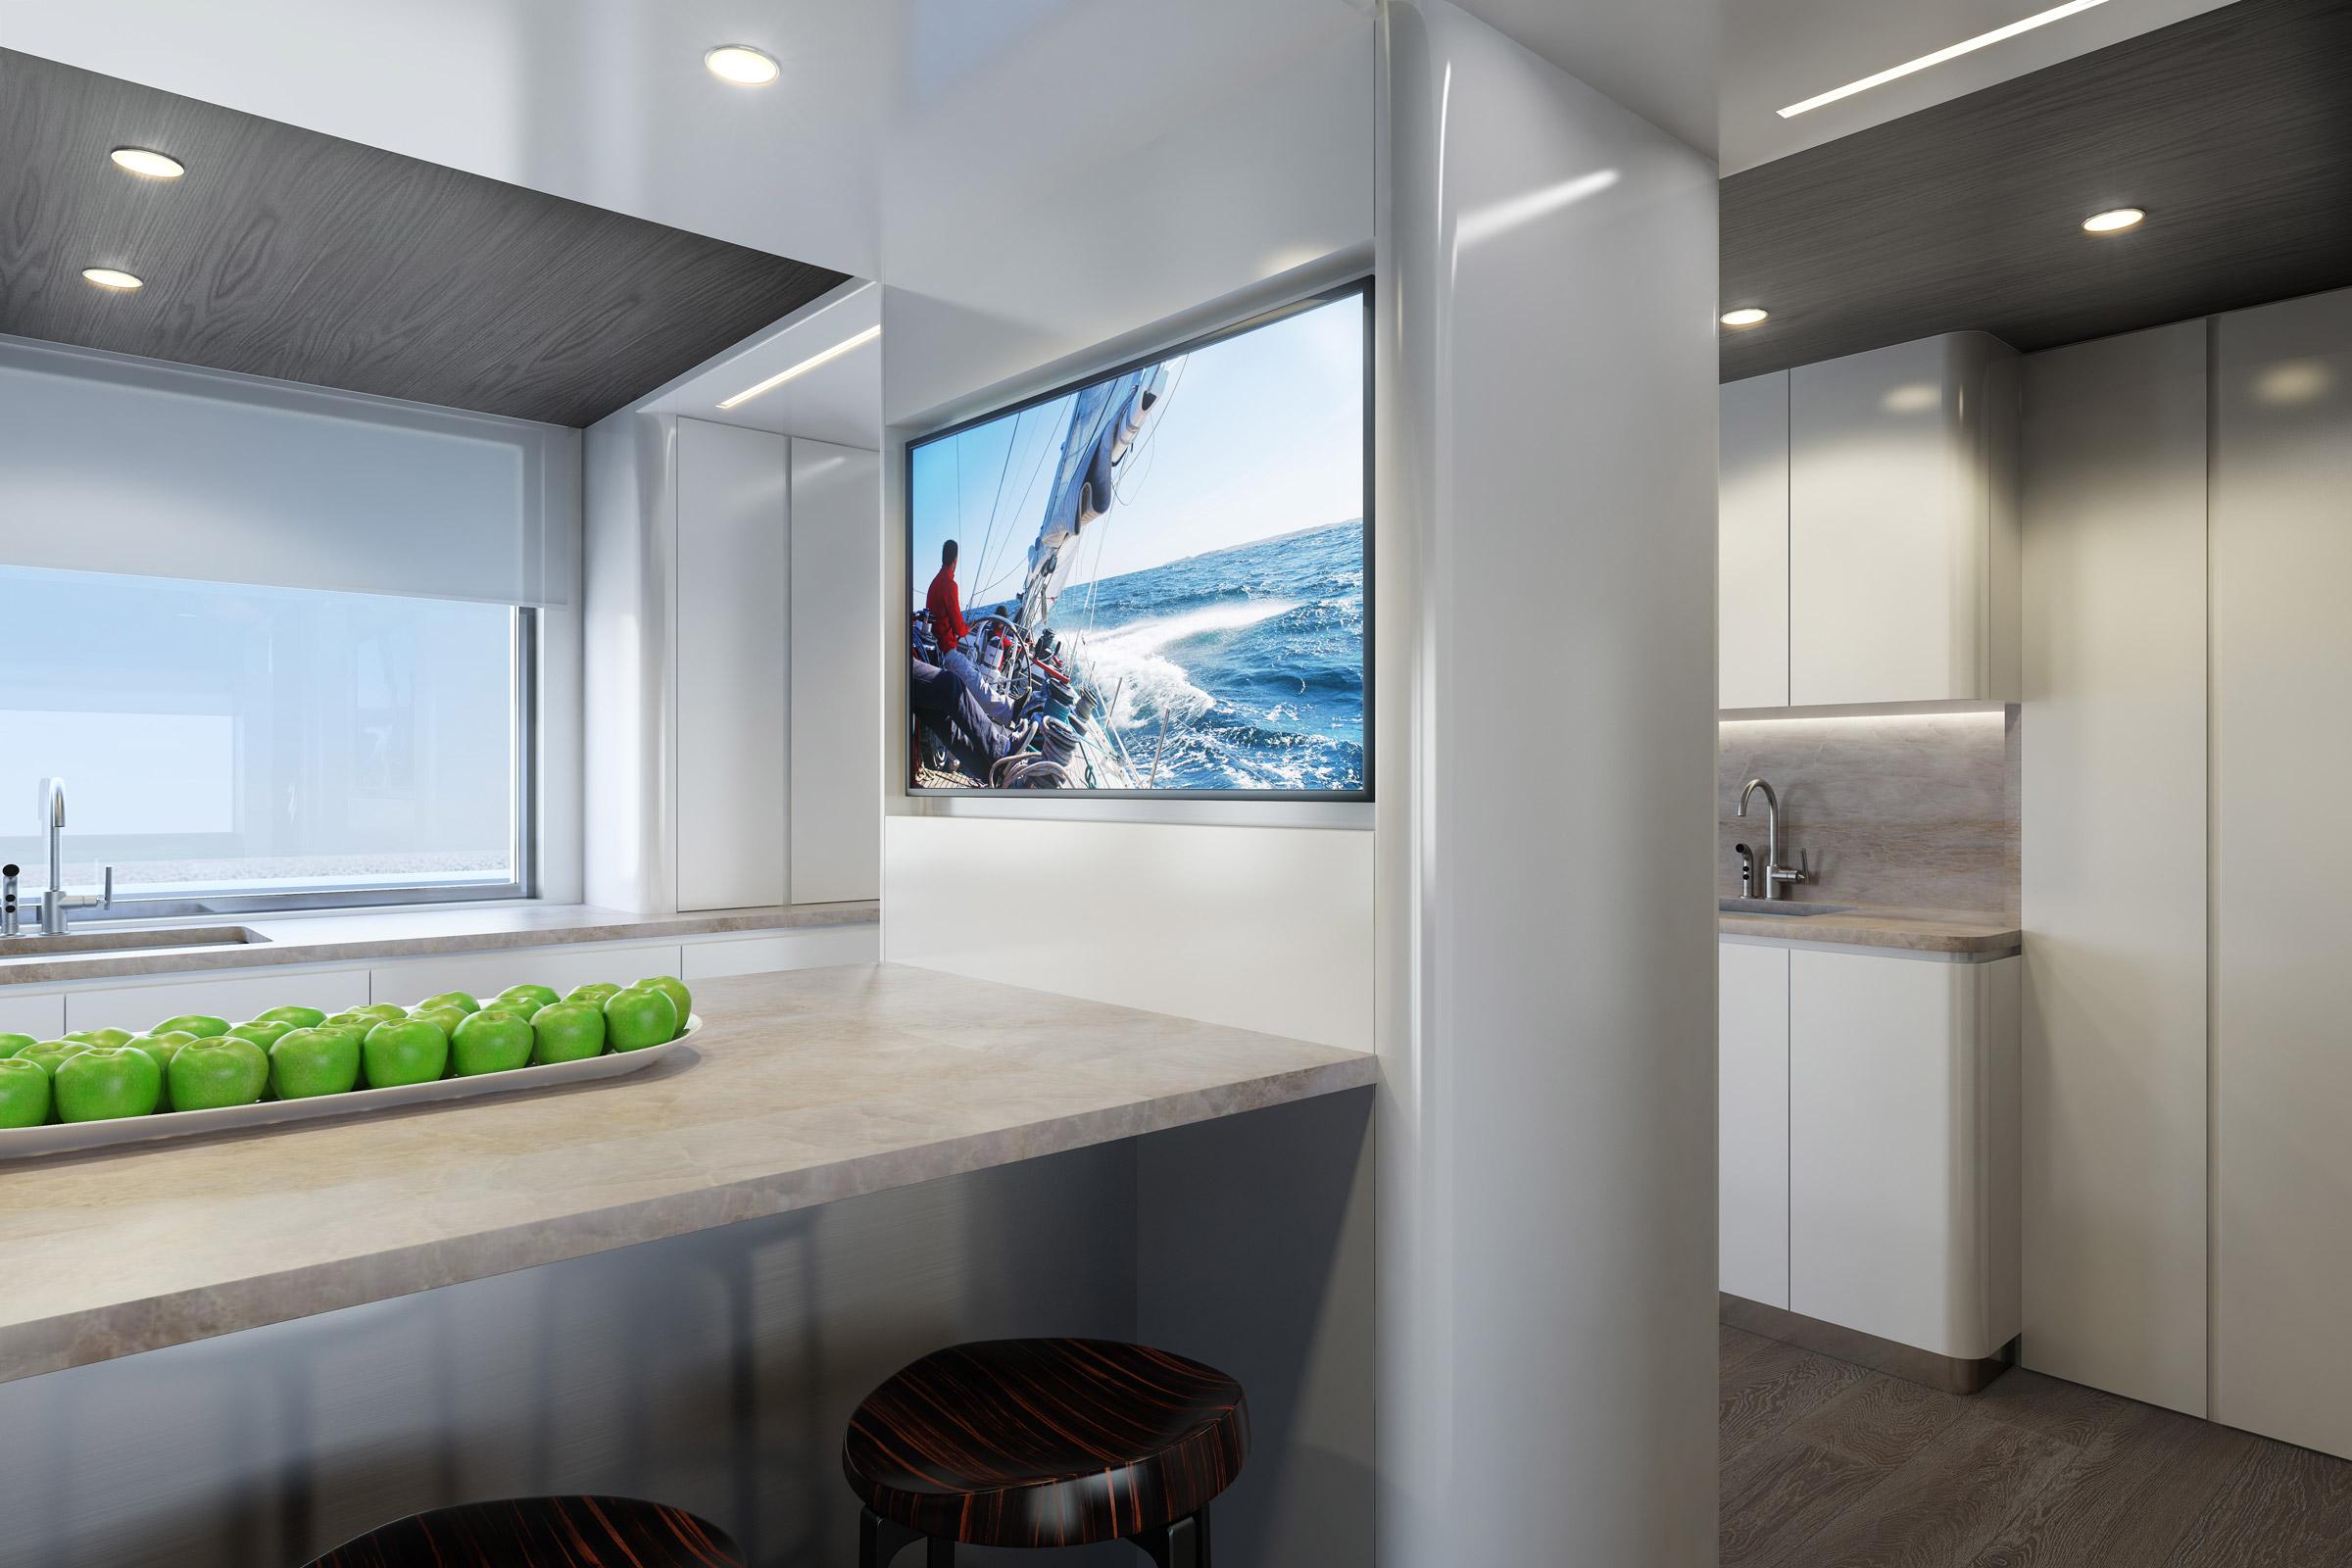 HH_Yacht_Kitchen_Cam4_V2_005